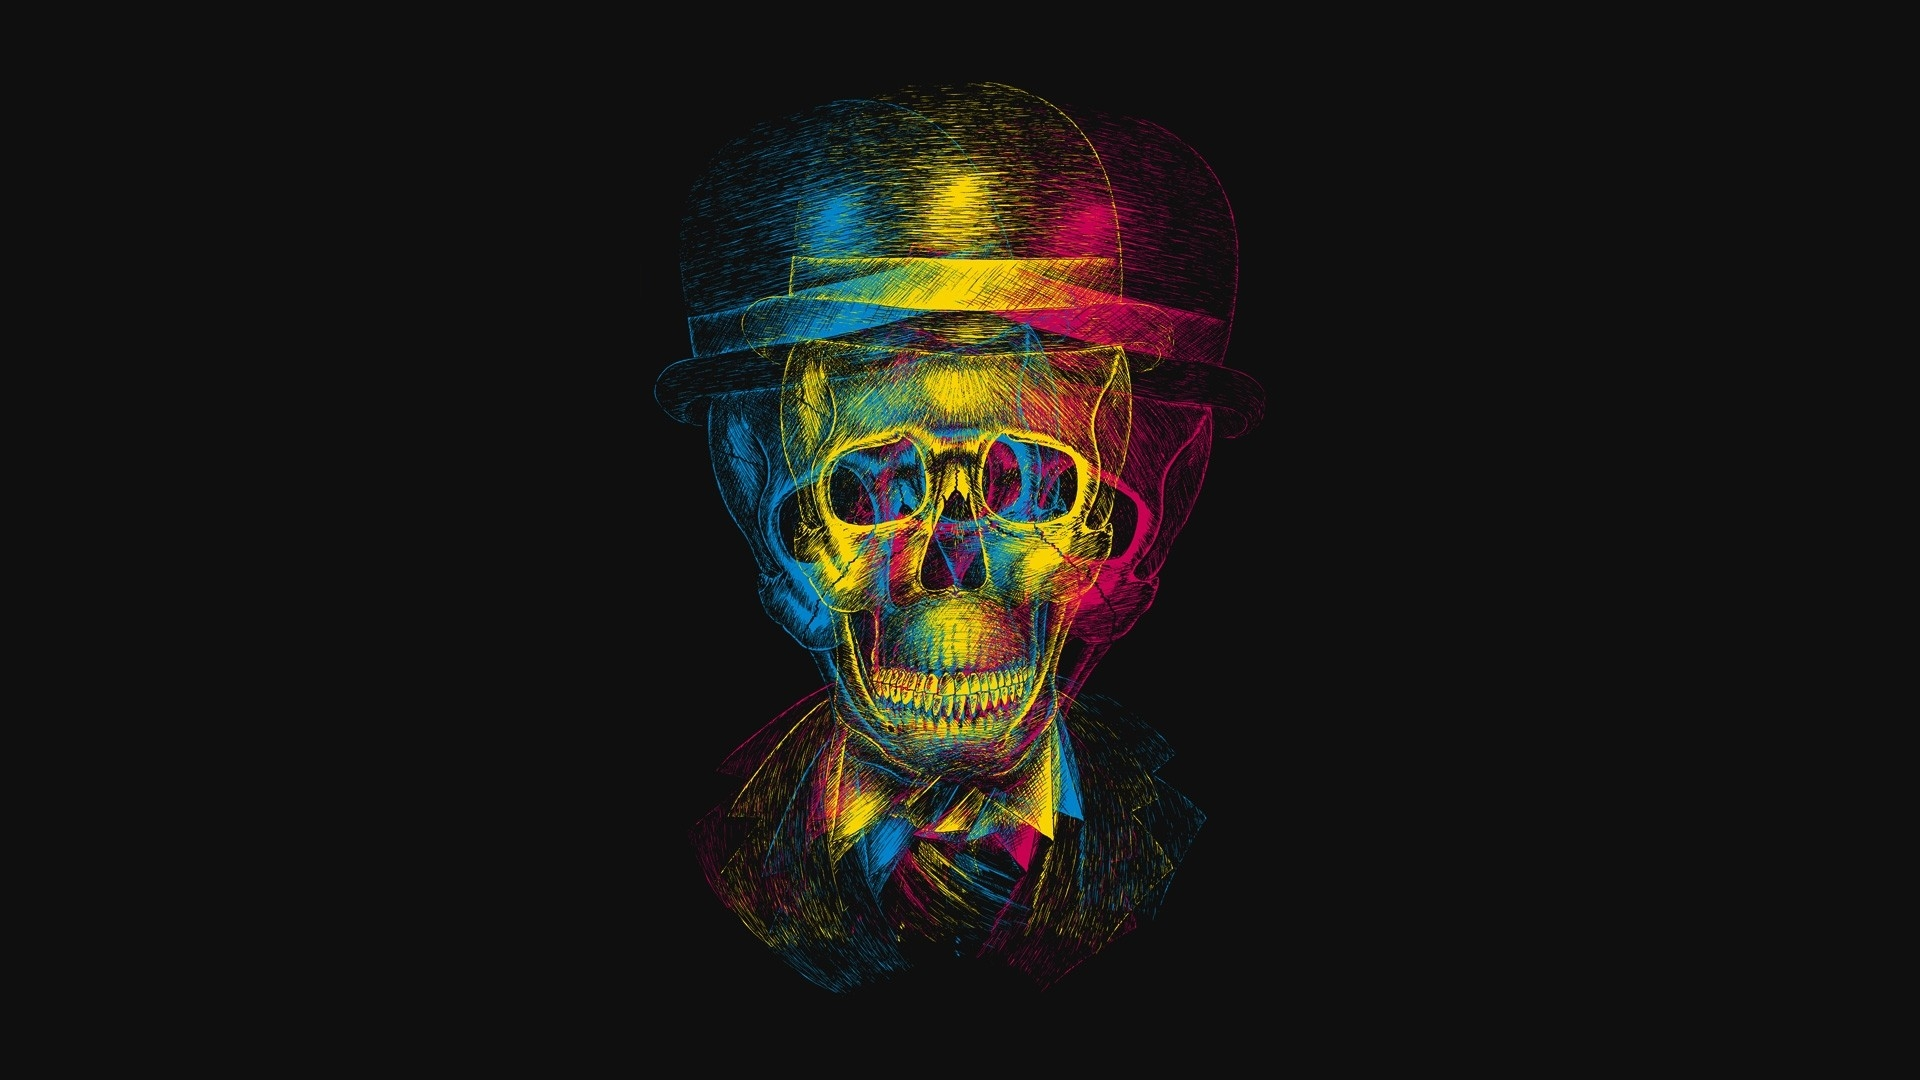 Full HD 1080p Skull Wallpapers Desktop Backgrounds 1920x1080